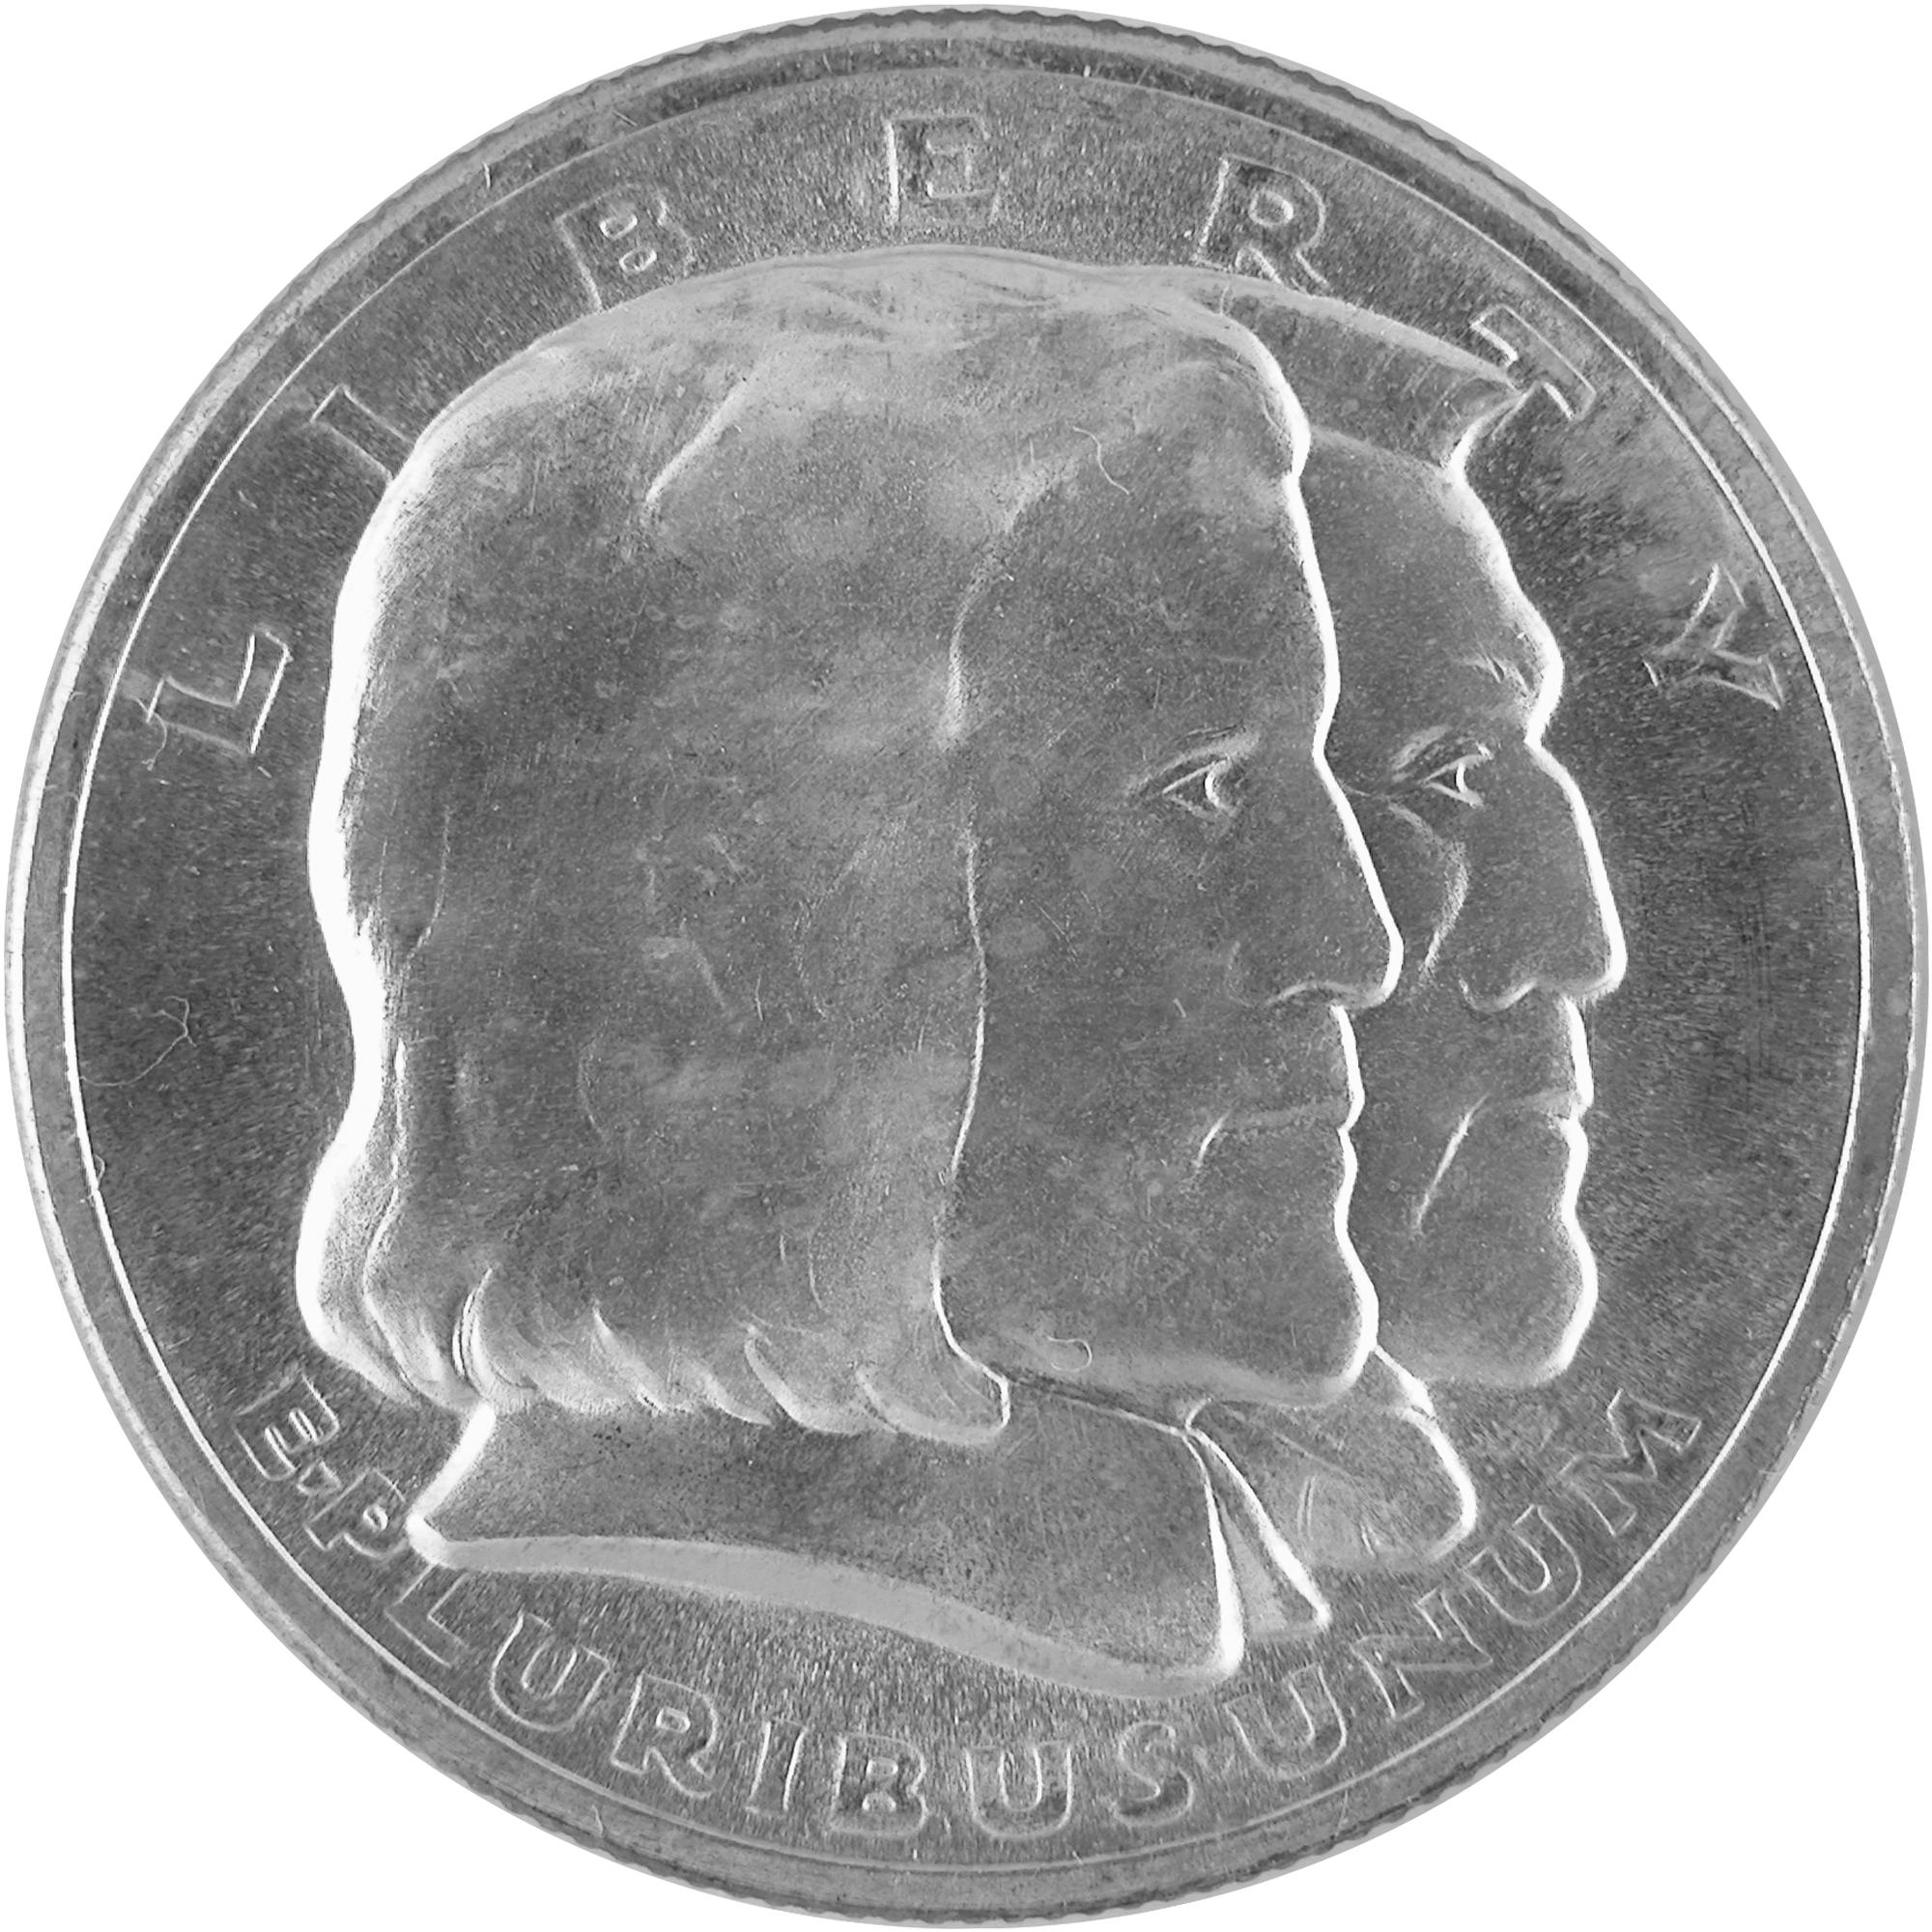 1936 Long Island Tercentenary Commemorative Silver Half Dollar Coin Obverse